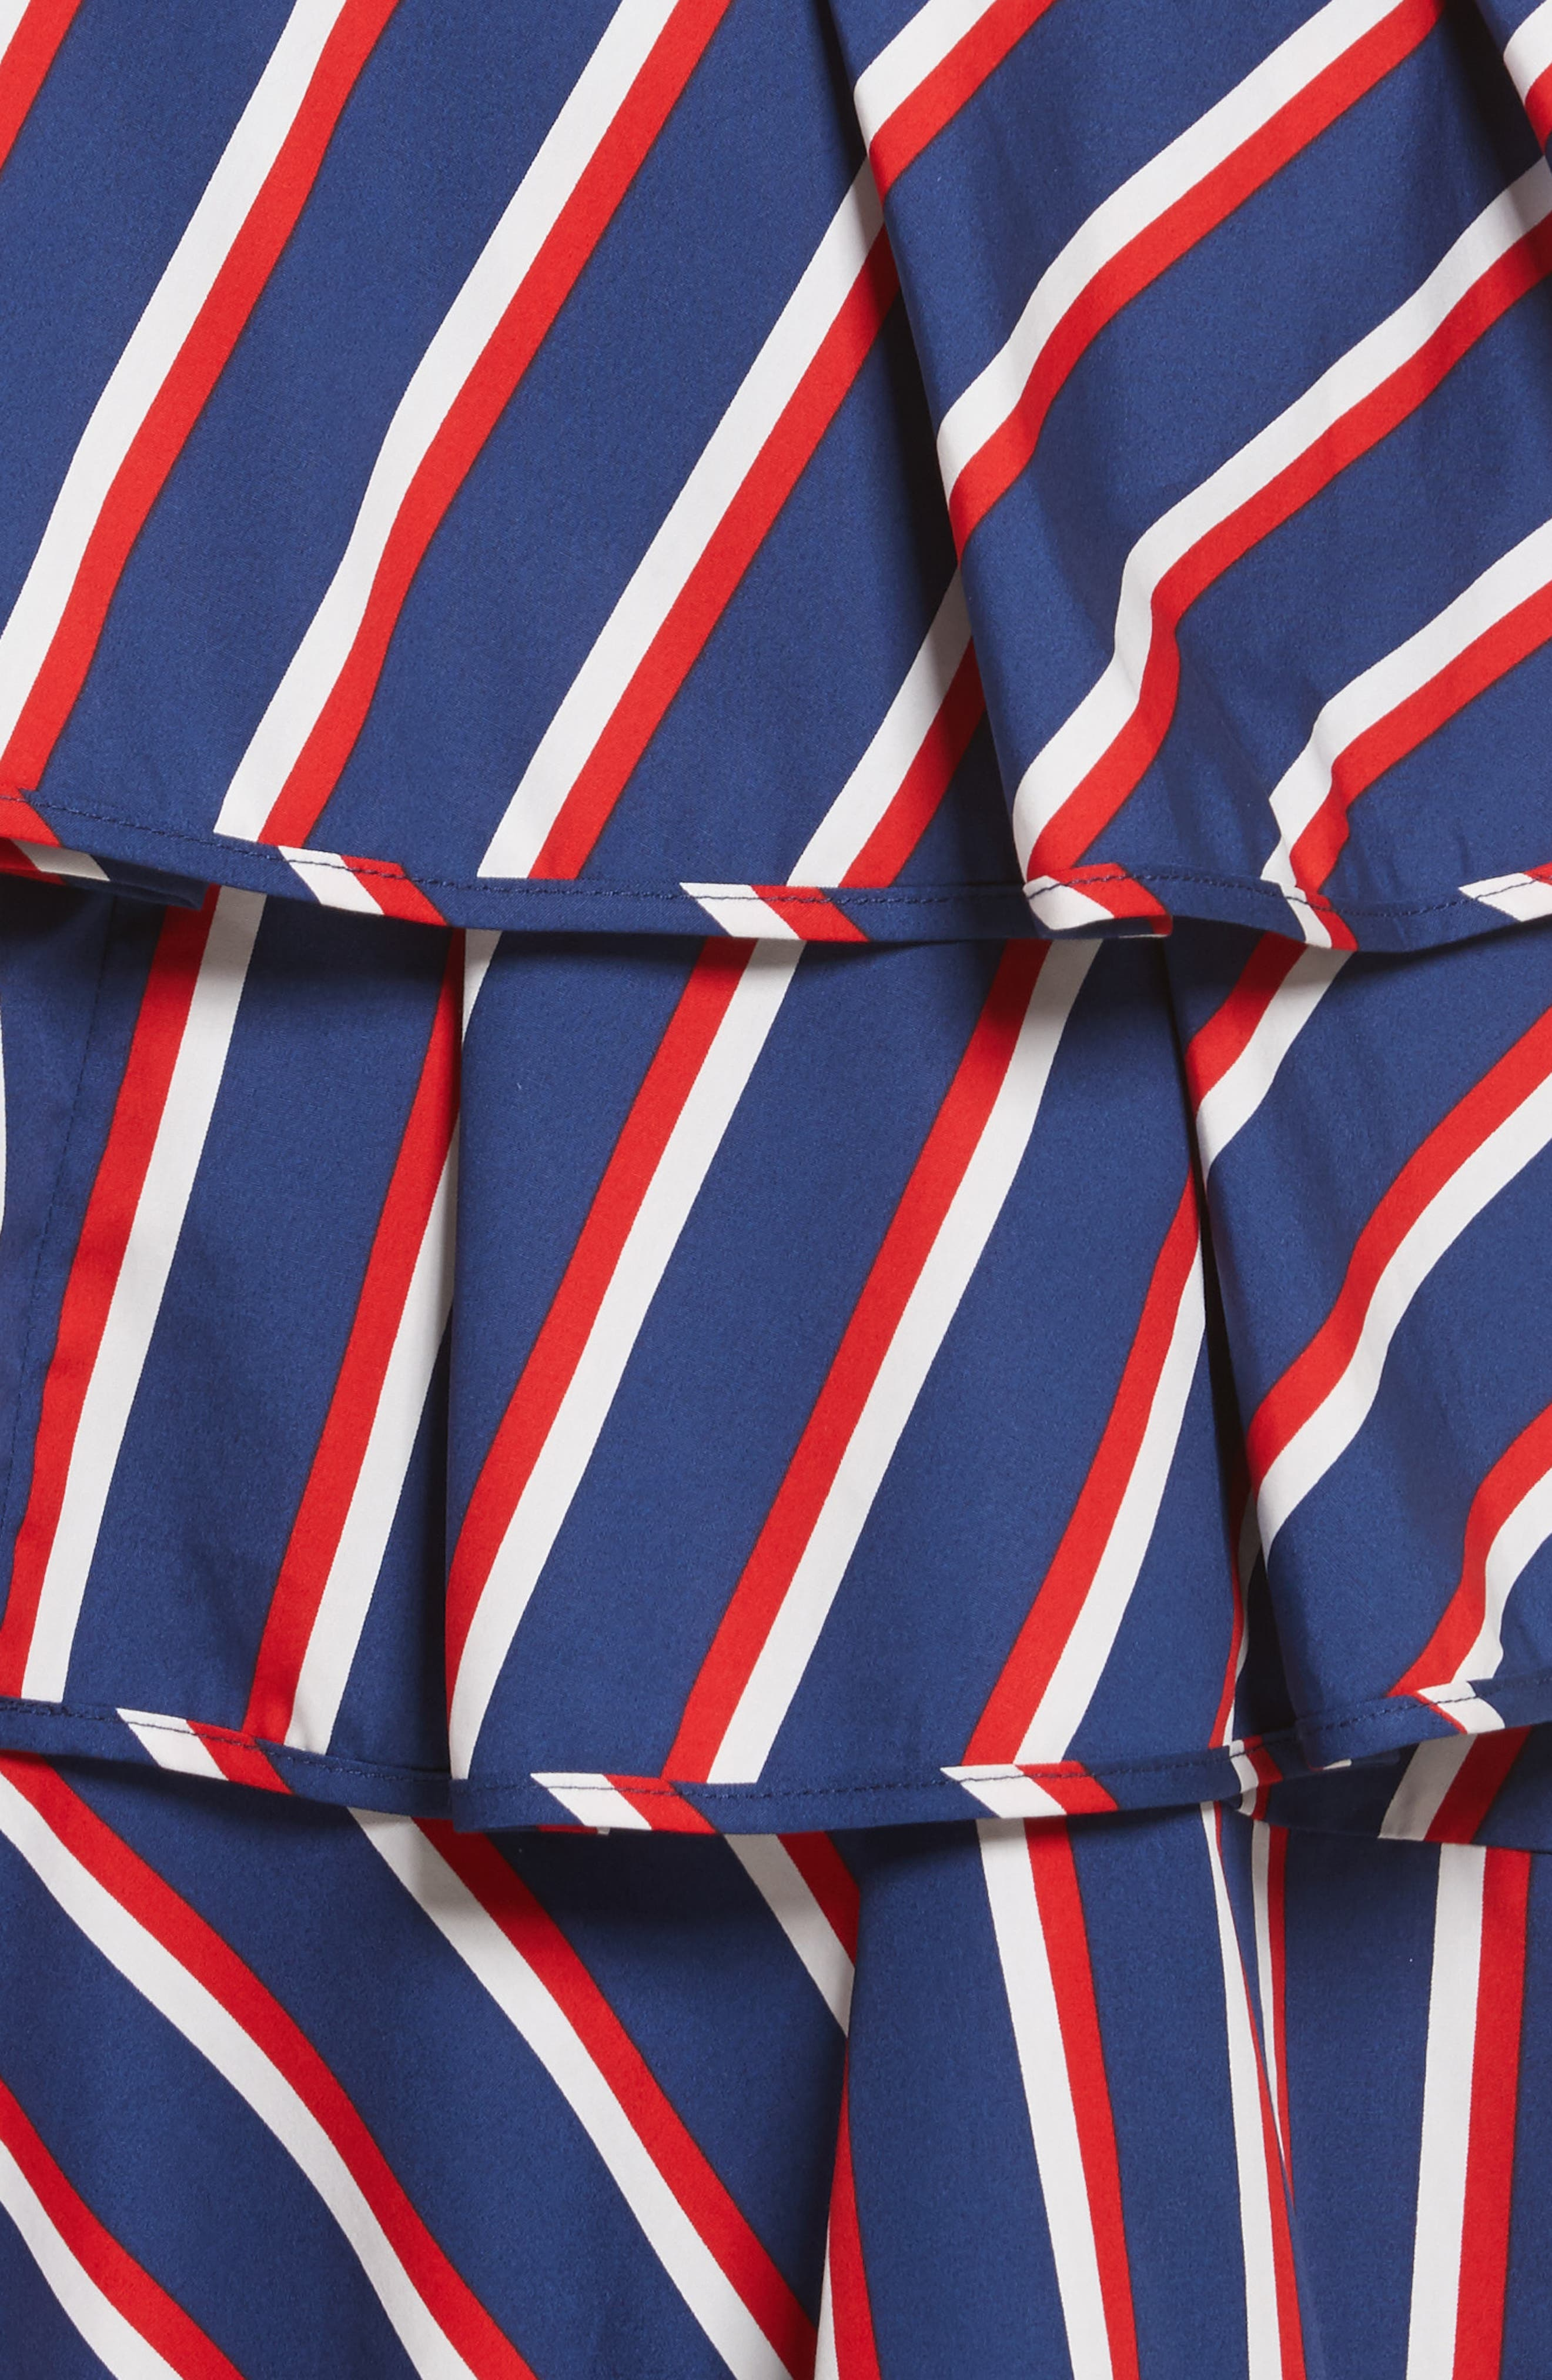 Laflora Aymmetrical Ruffle Midi Dress,                             Alternate thumbnail 5, color,                             475